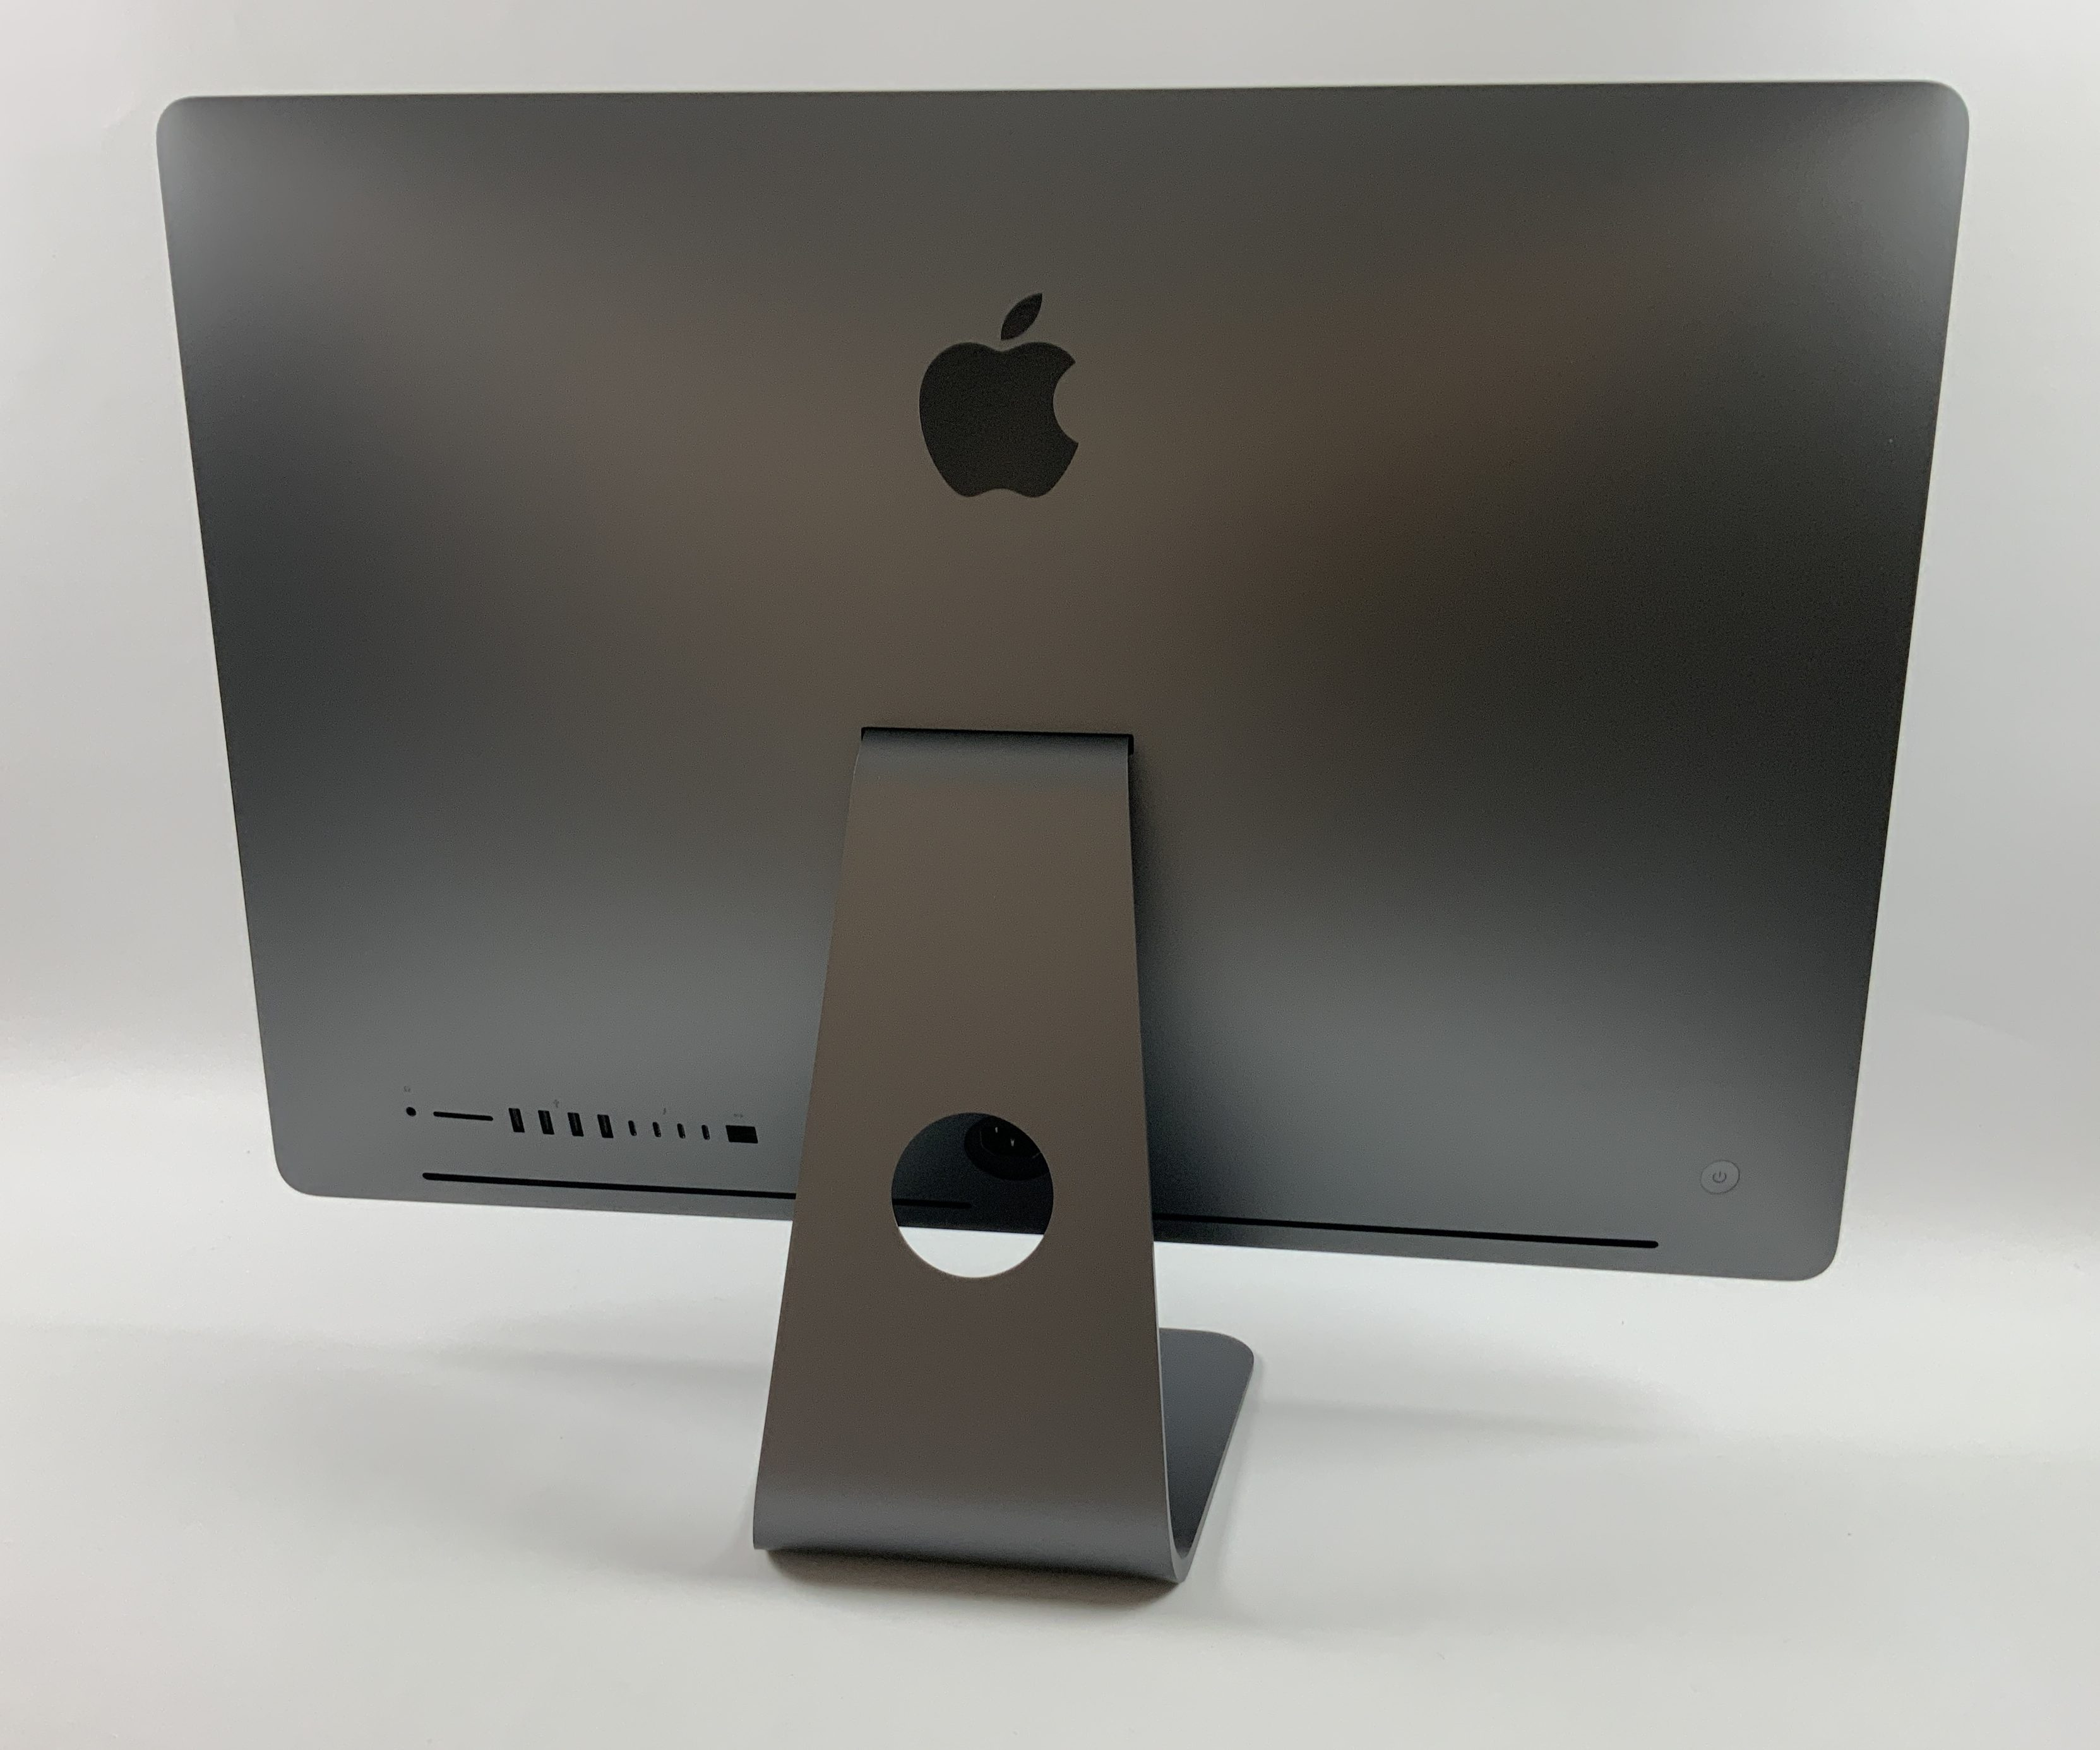 iMac Pro 2017 (Intel 8-Core Xeon W 3.2 GHz 32 GB RAM 1 TB SSD), Intel 8-Core Xeon W 3.2 GHz, 32 GB RAM, 1 TB SSD, Kuva 2